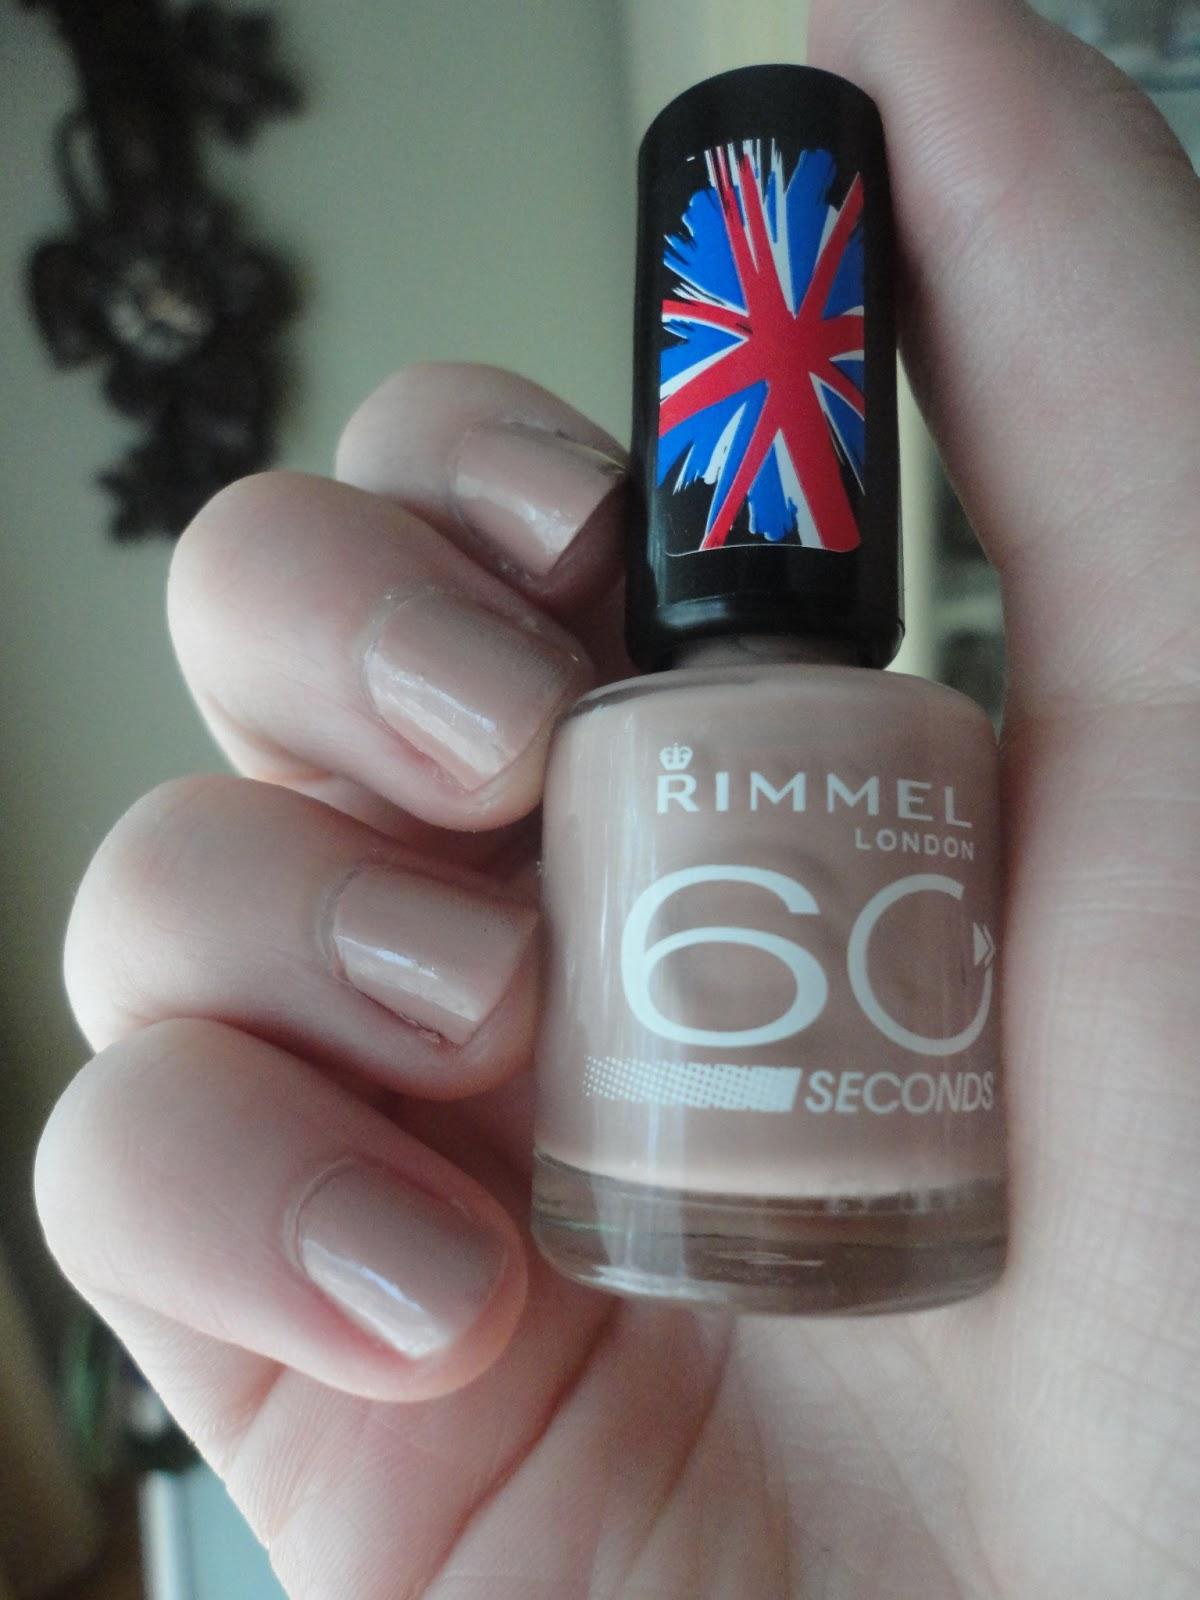 Rimmel 60 Seconds Nail Polish in Caramel Cupcake | Natalie Loves Beauty